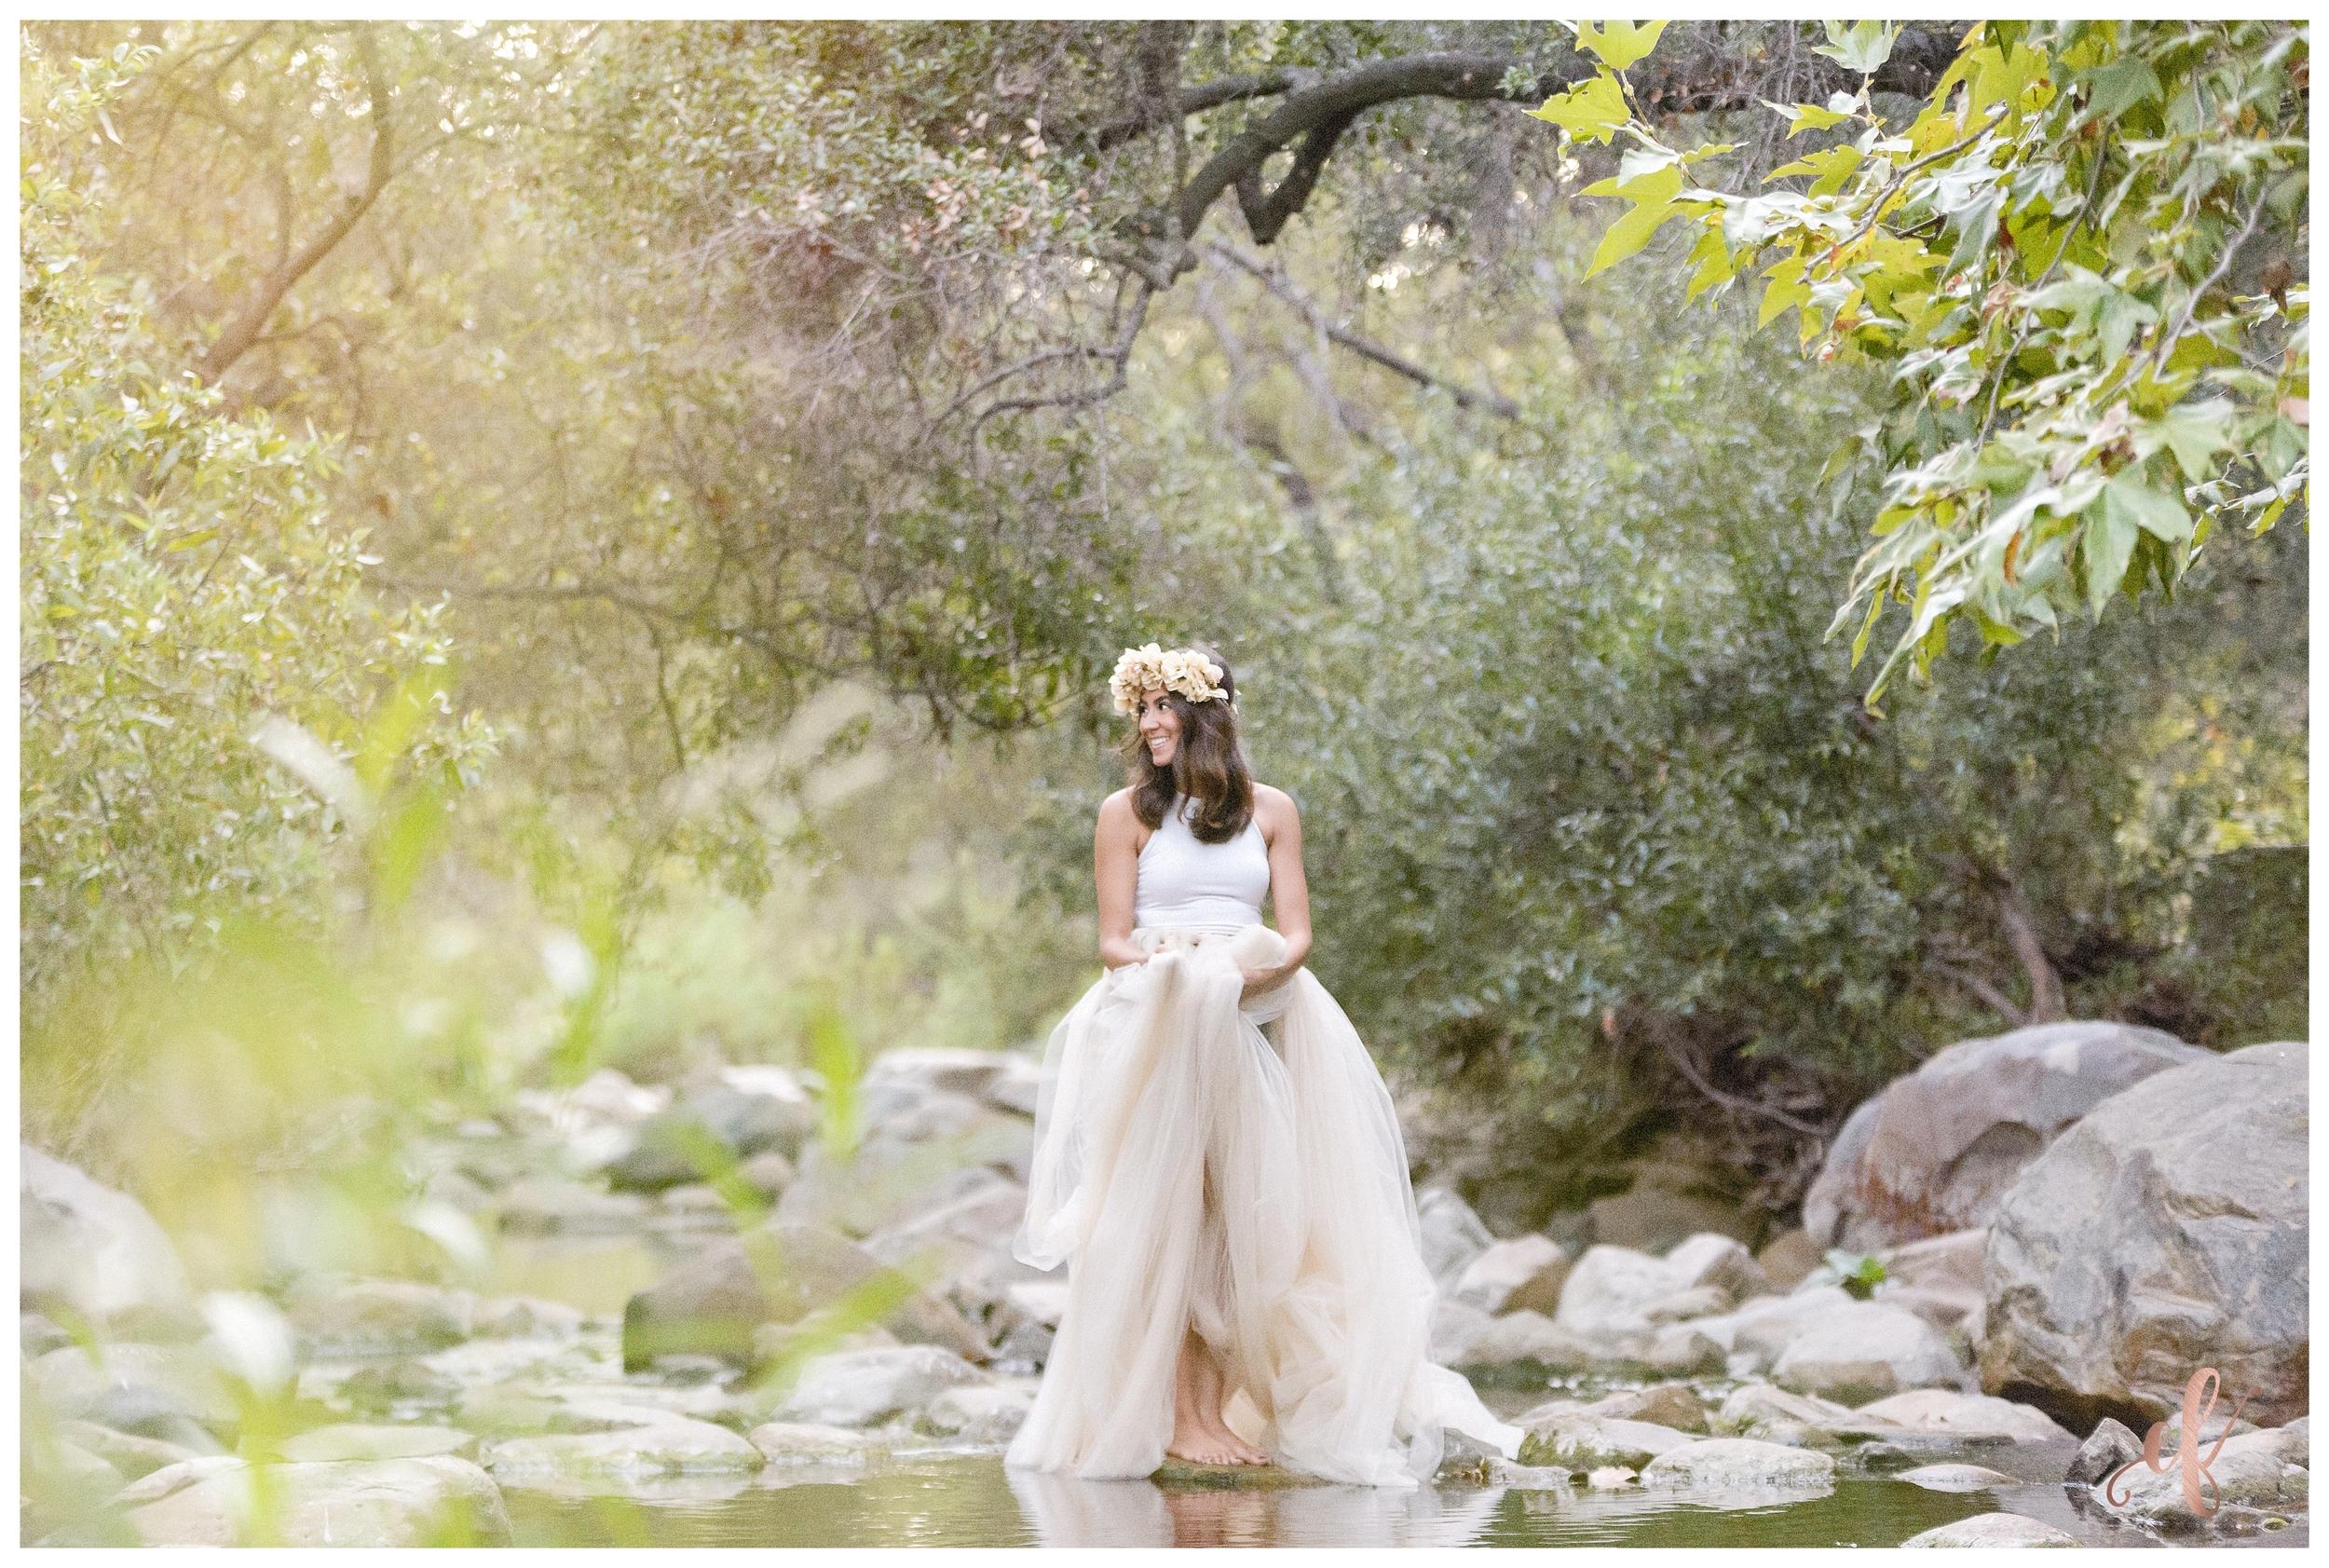 San Diego Portrait Photography   Elfin Forest   Tulle Skirt